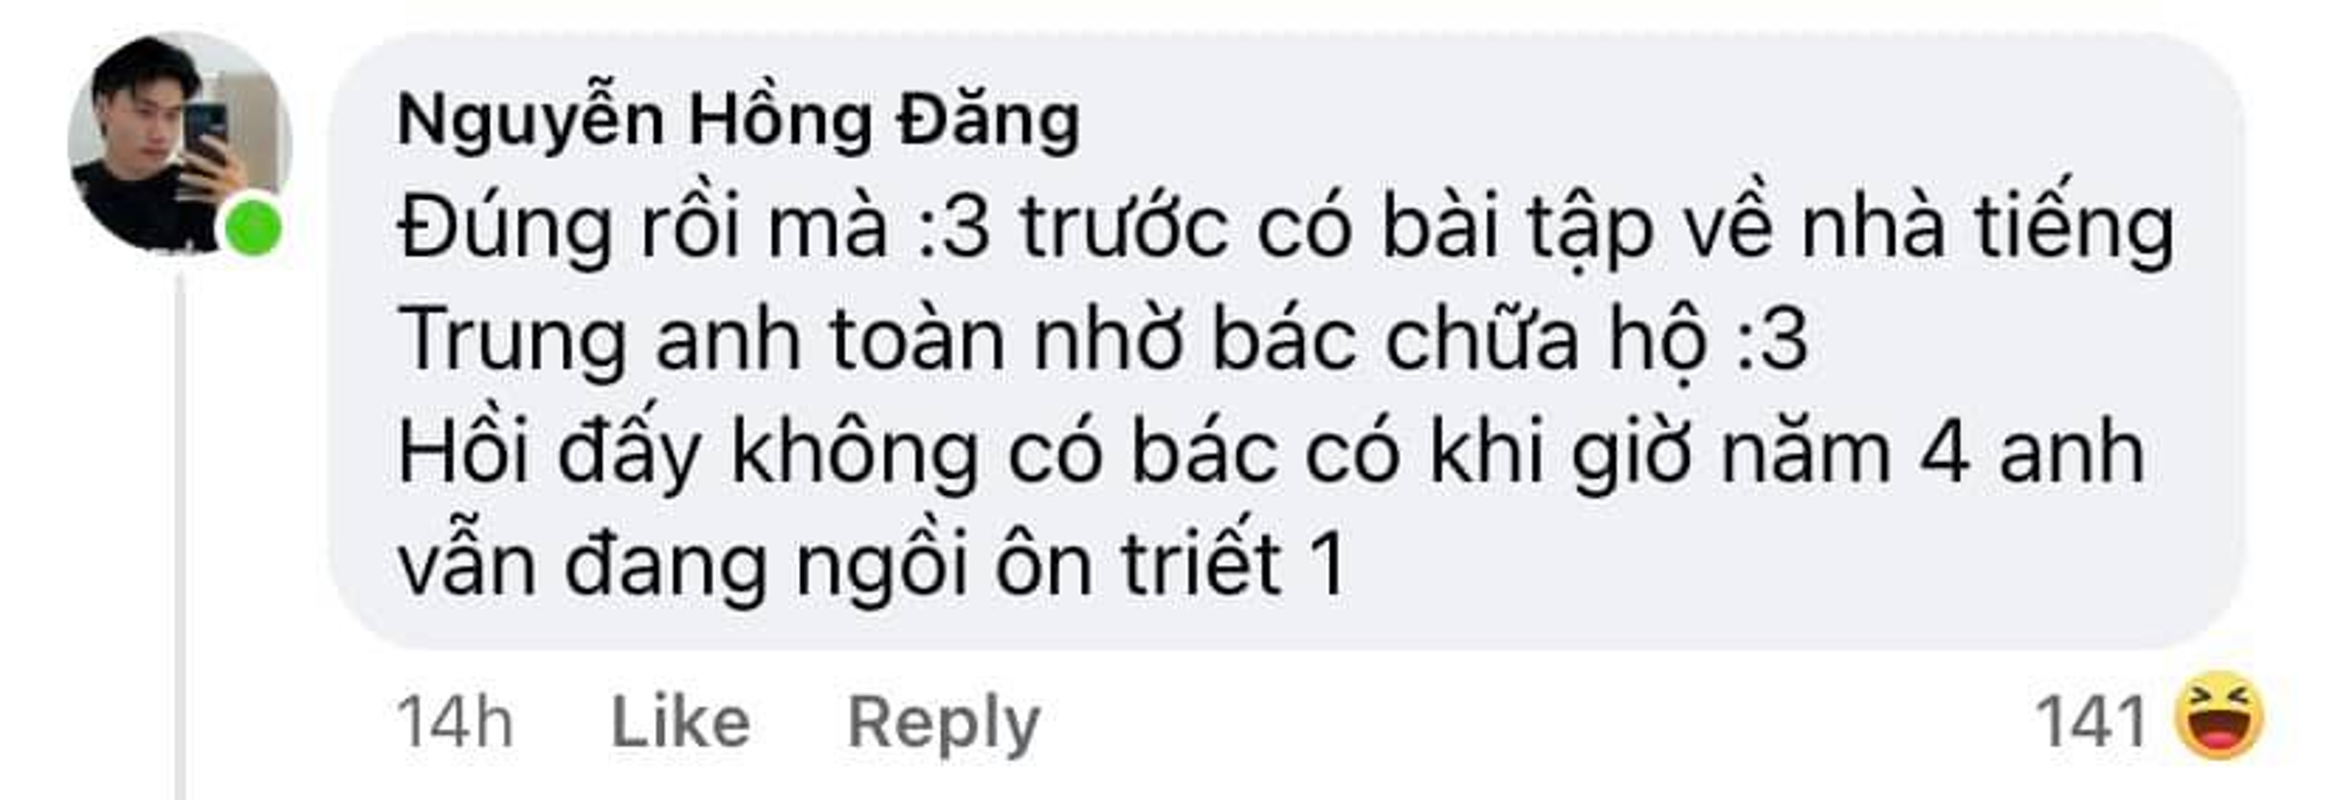 Lo danh tinh bac bao ve thao 3 ngoai ngu hot nhat MXH-Hinh-6